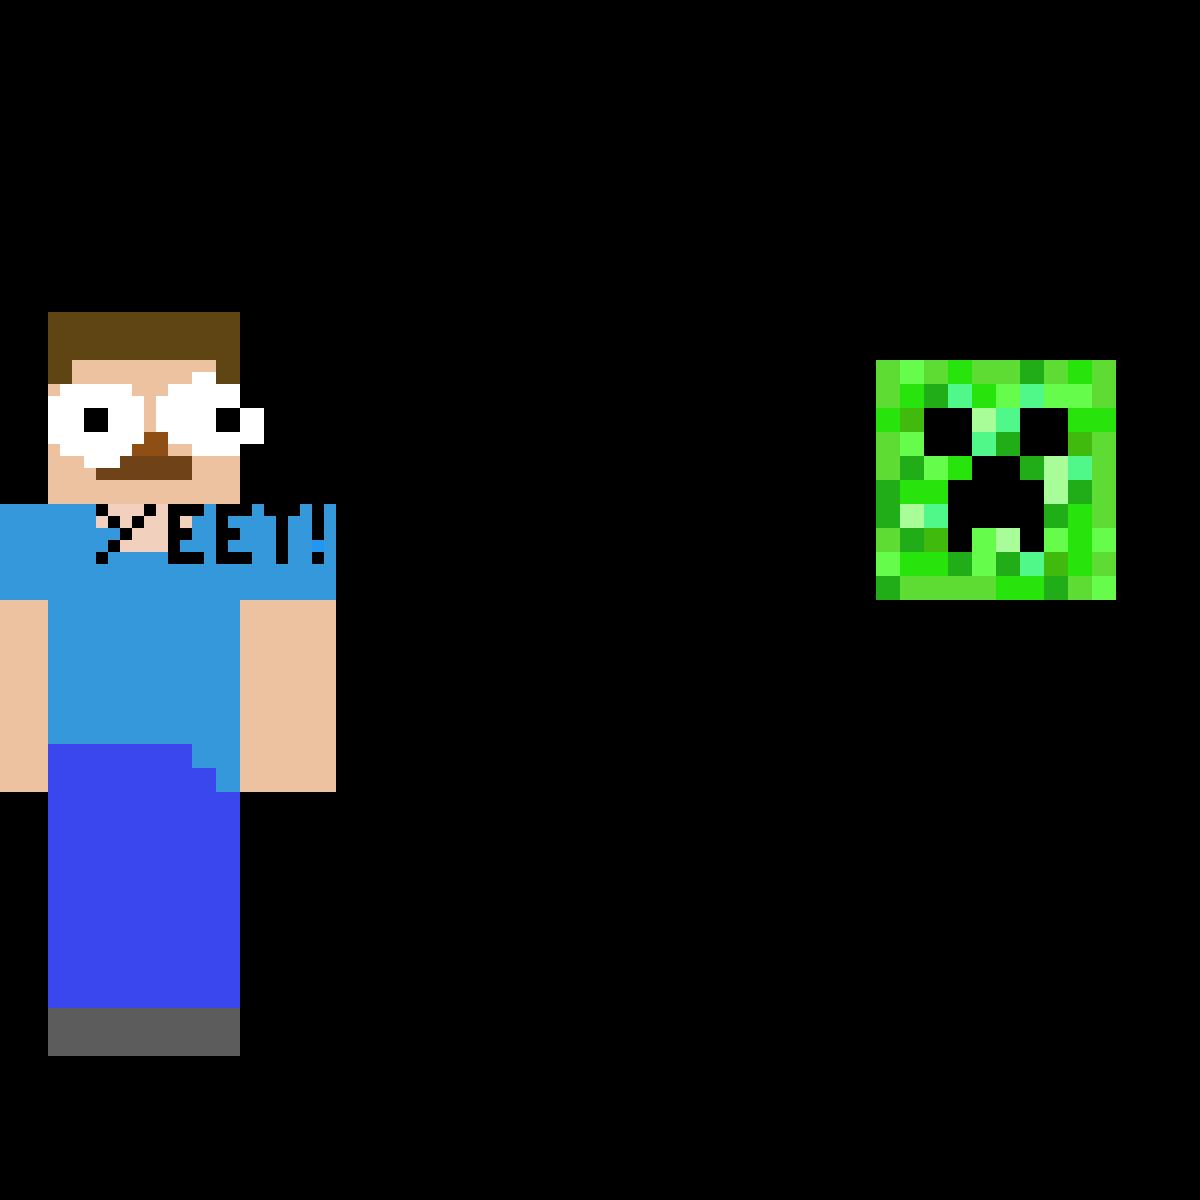 Pixilart Minecraft Vs Yeet 2 By Yotta Yeet101